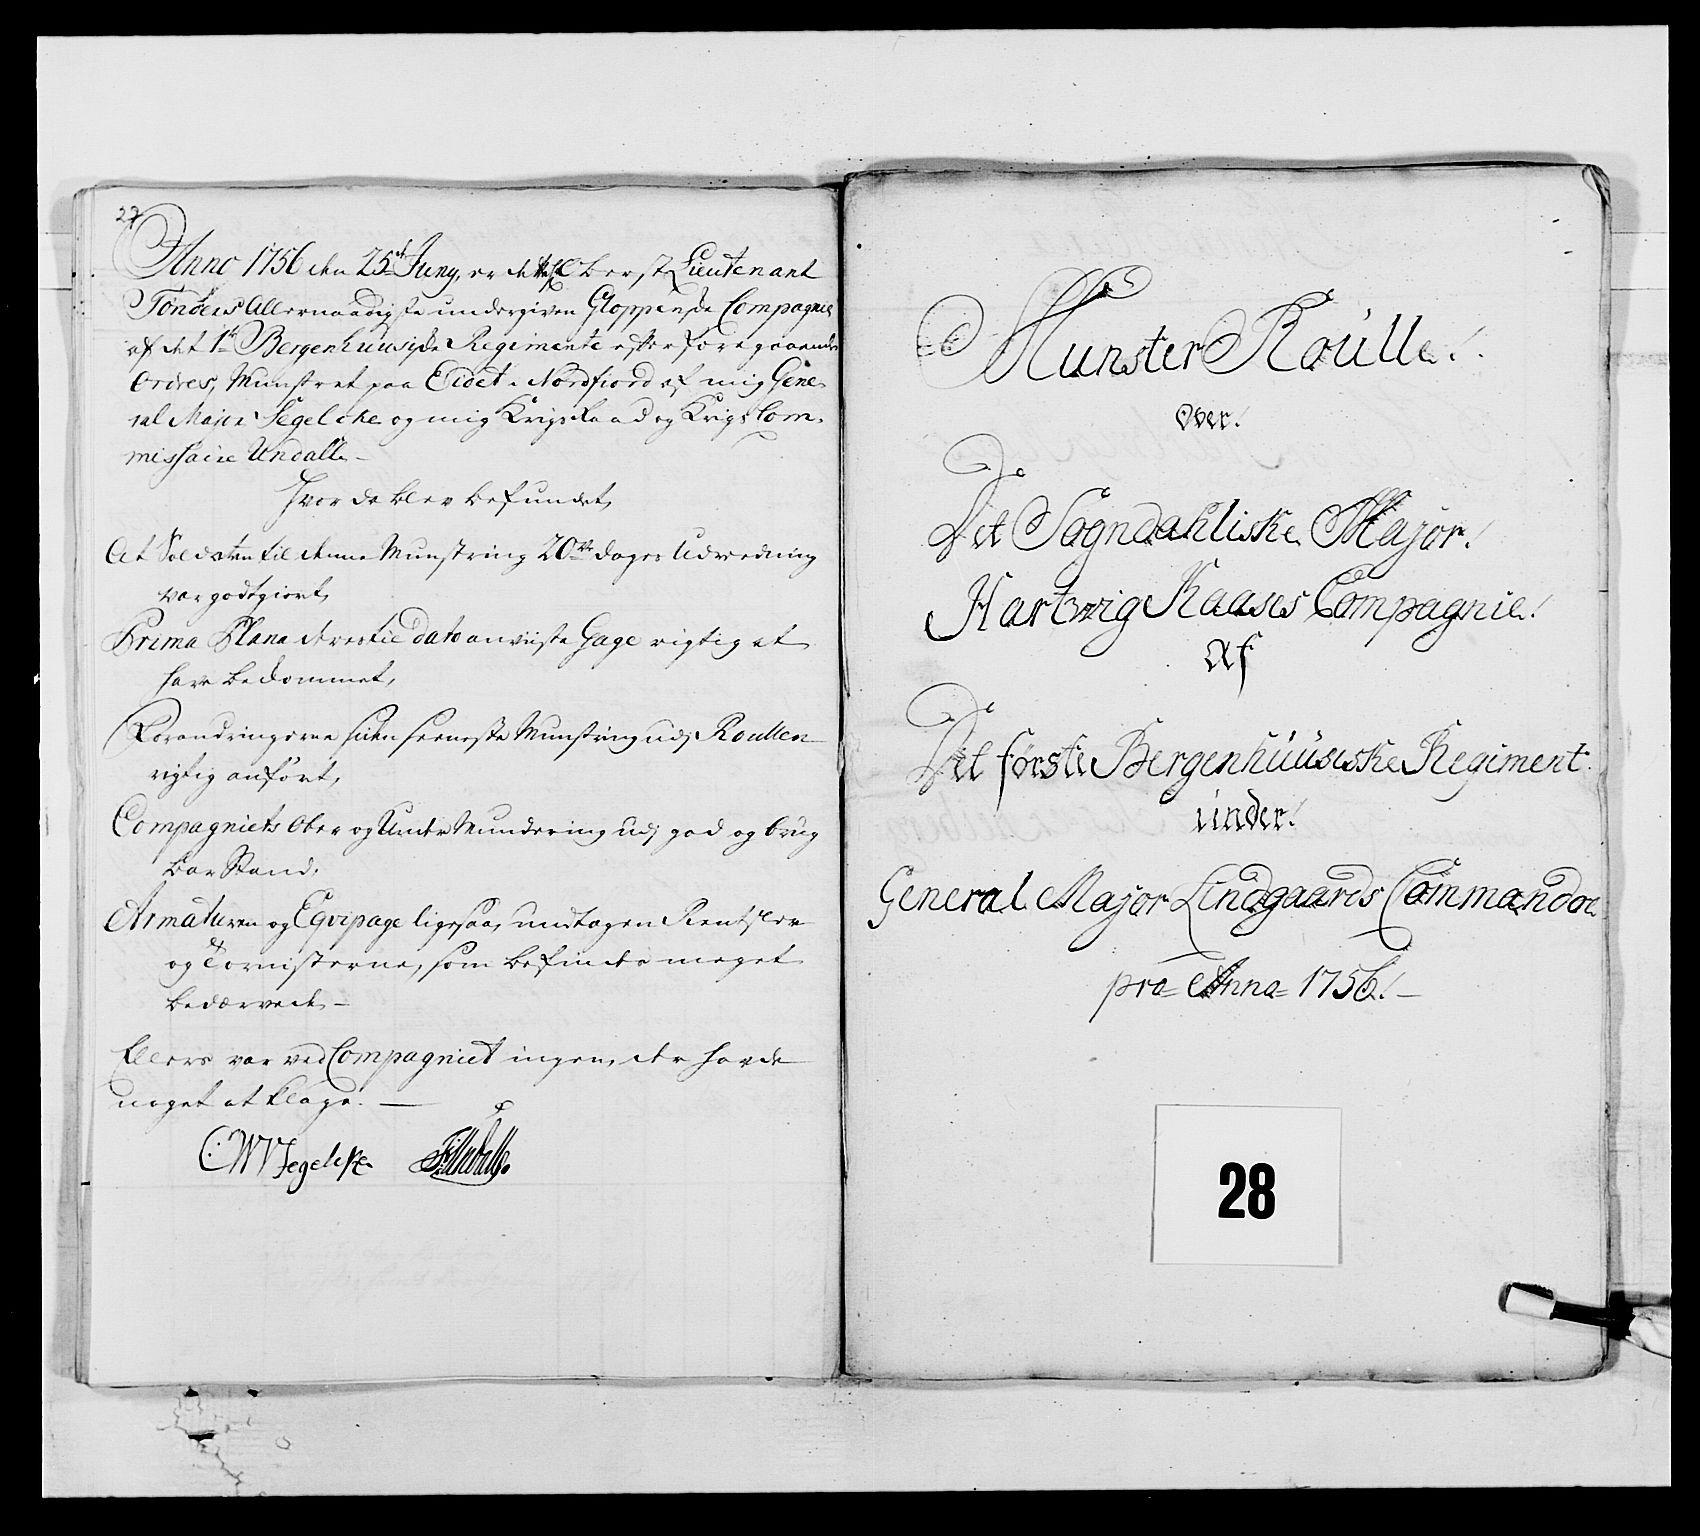 RA, Kommanderende general (KG I) med Det norske krigsdirektorium, E/Ea/L0517: 1. Bergenhusiske regiment, 1742-1756, s. 421